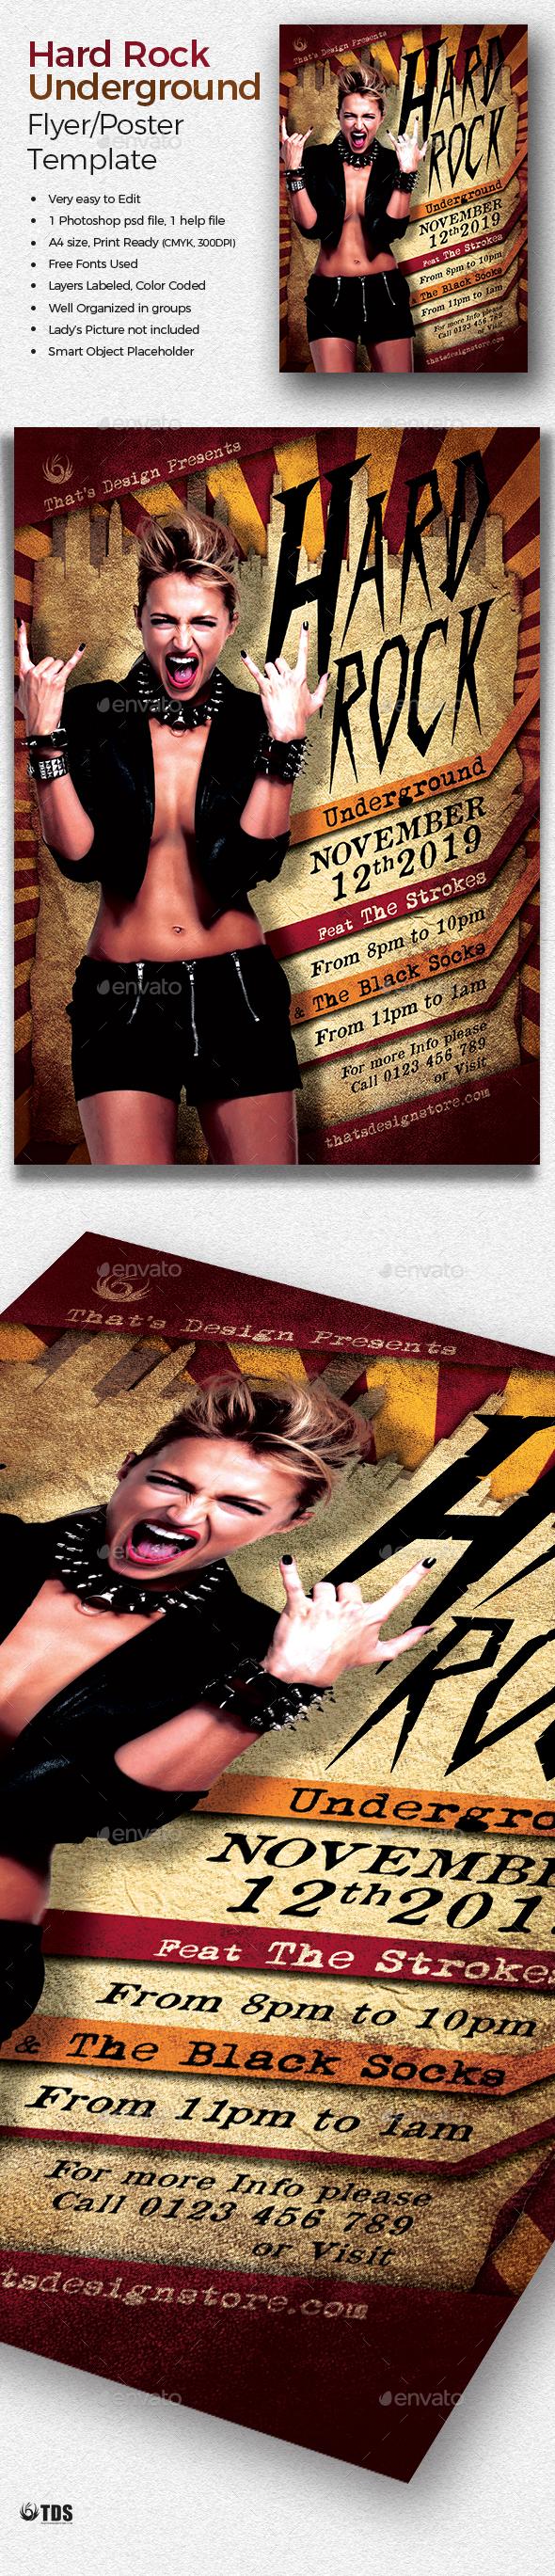 Hard Rock Underground Flyer Template - Concerts Events